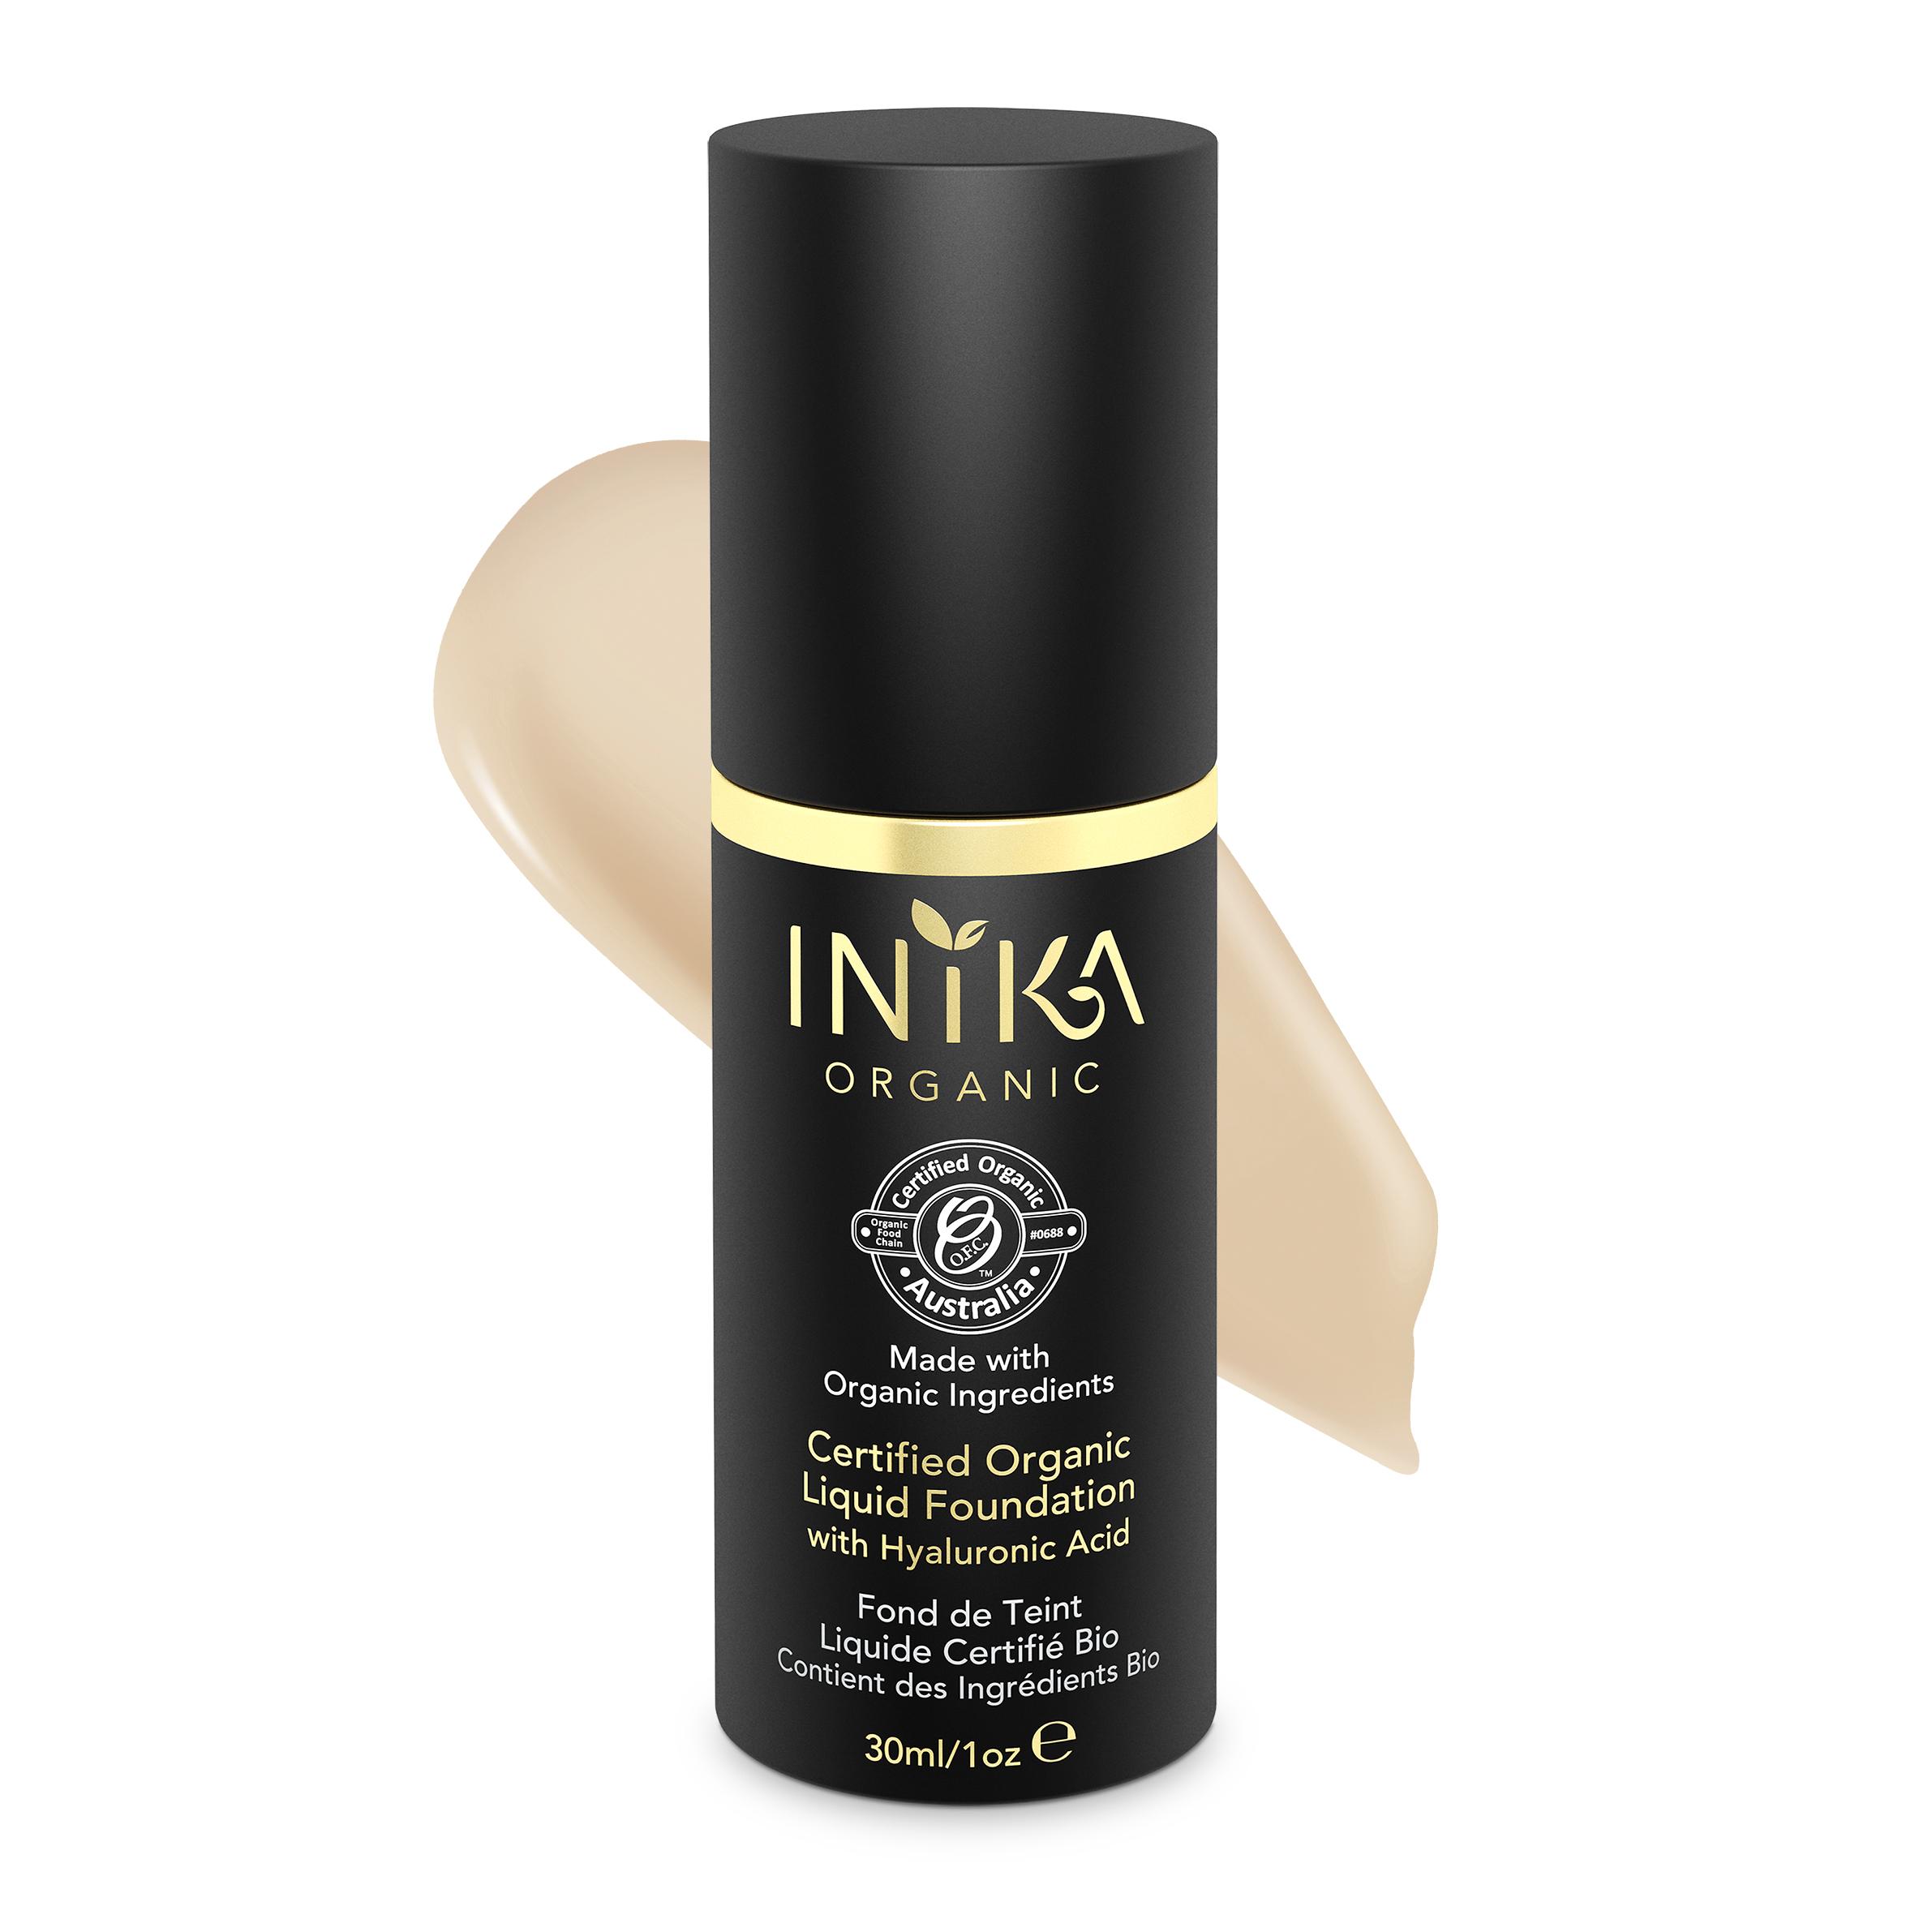 INIKA Certified Organic Liquid Foundation Nude 30ml With Product